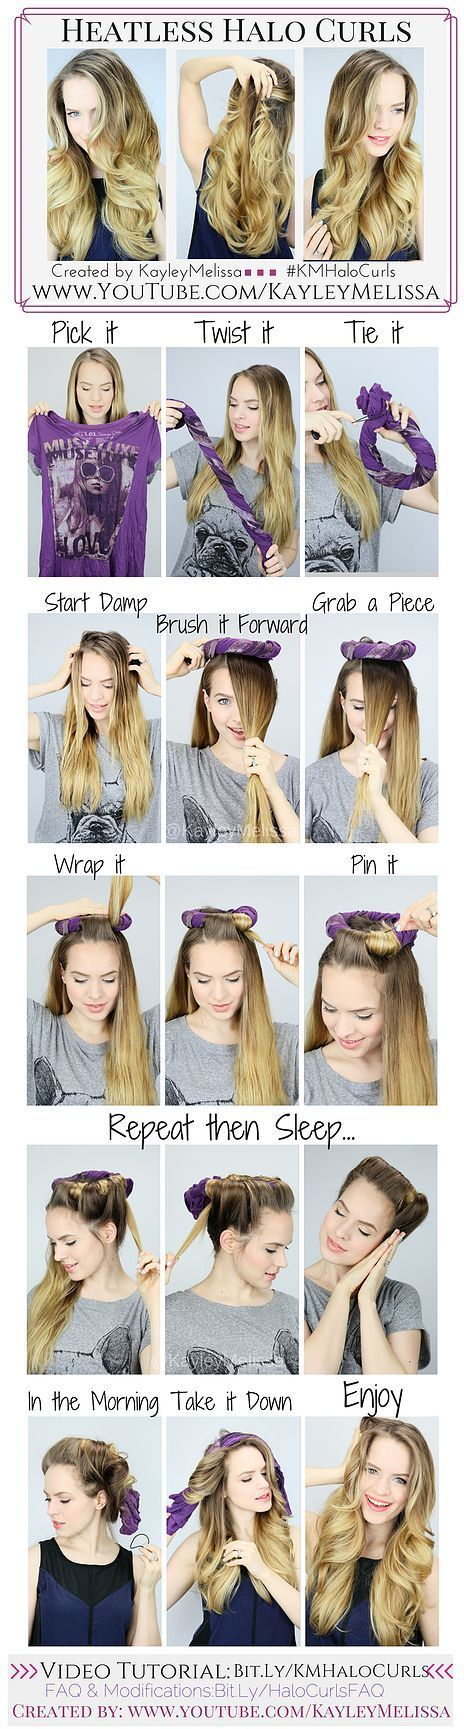 best cabelos images on pinterest bridal hairstyles hair ideas